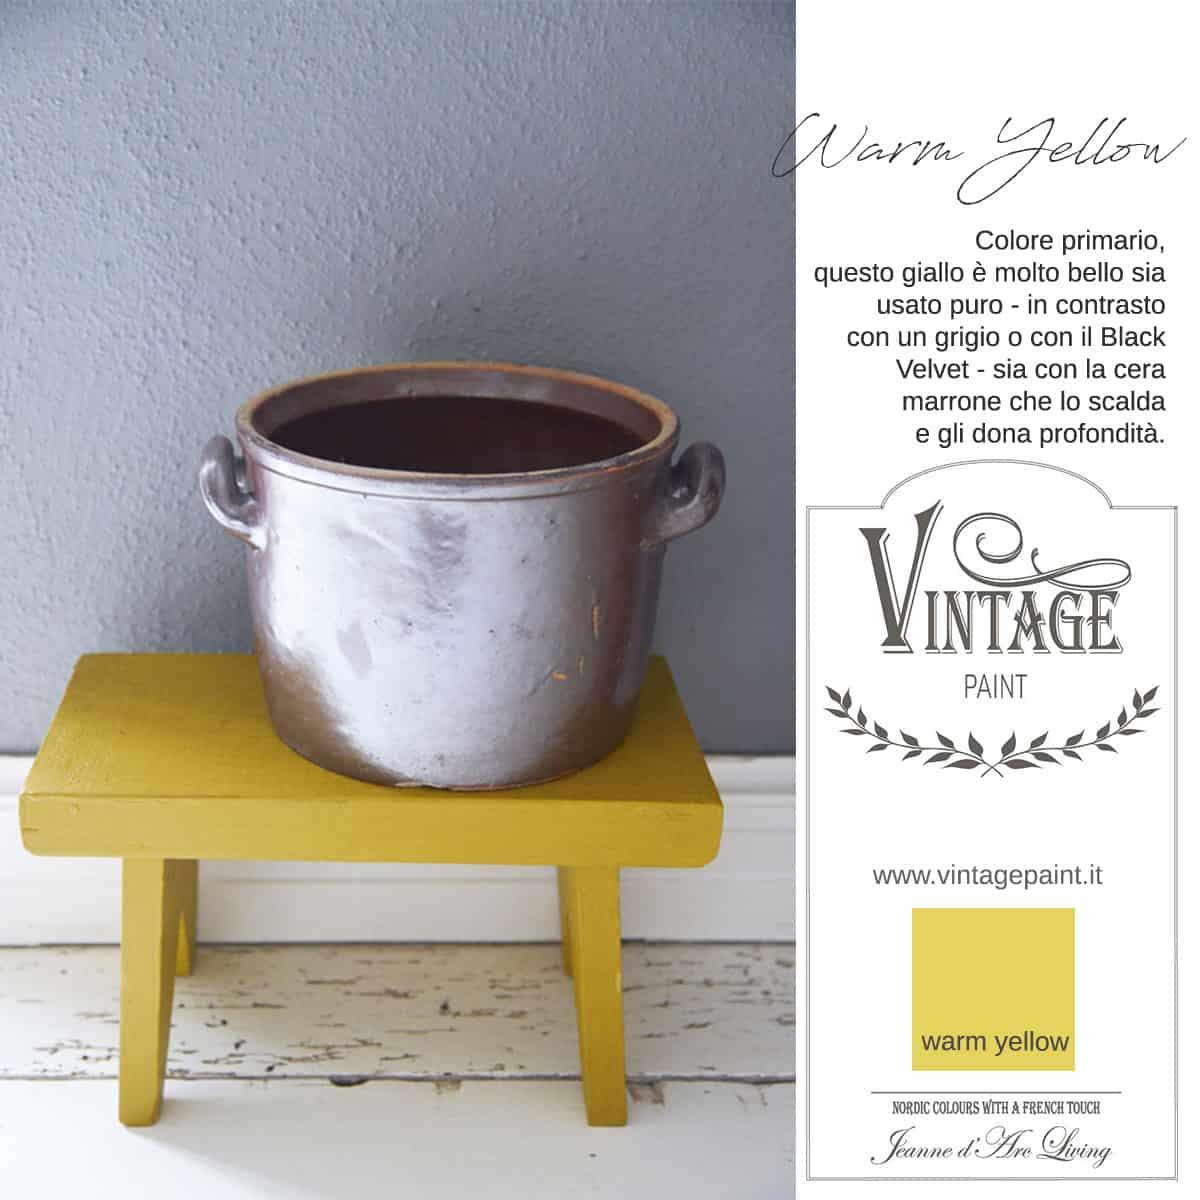 warm yellow giallo vintage chalk paint vernici shabby chic autentico look gesso